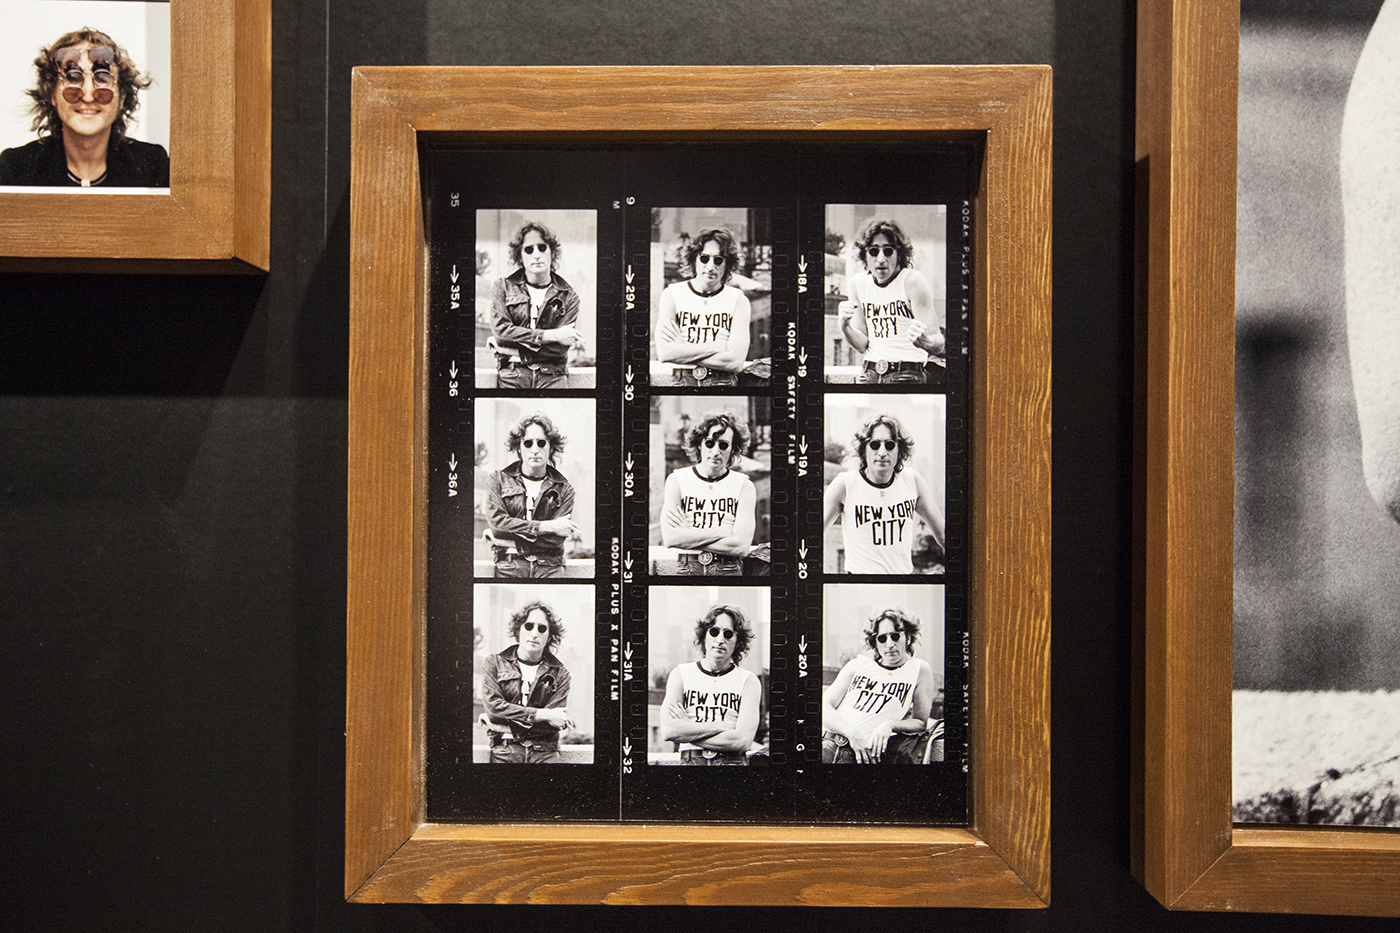 m-0072 【レポート】ロックの歴史が凝縮。フジロックファンも必見のボブ・グルーエン写真展